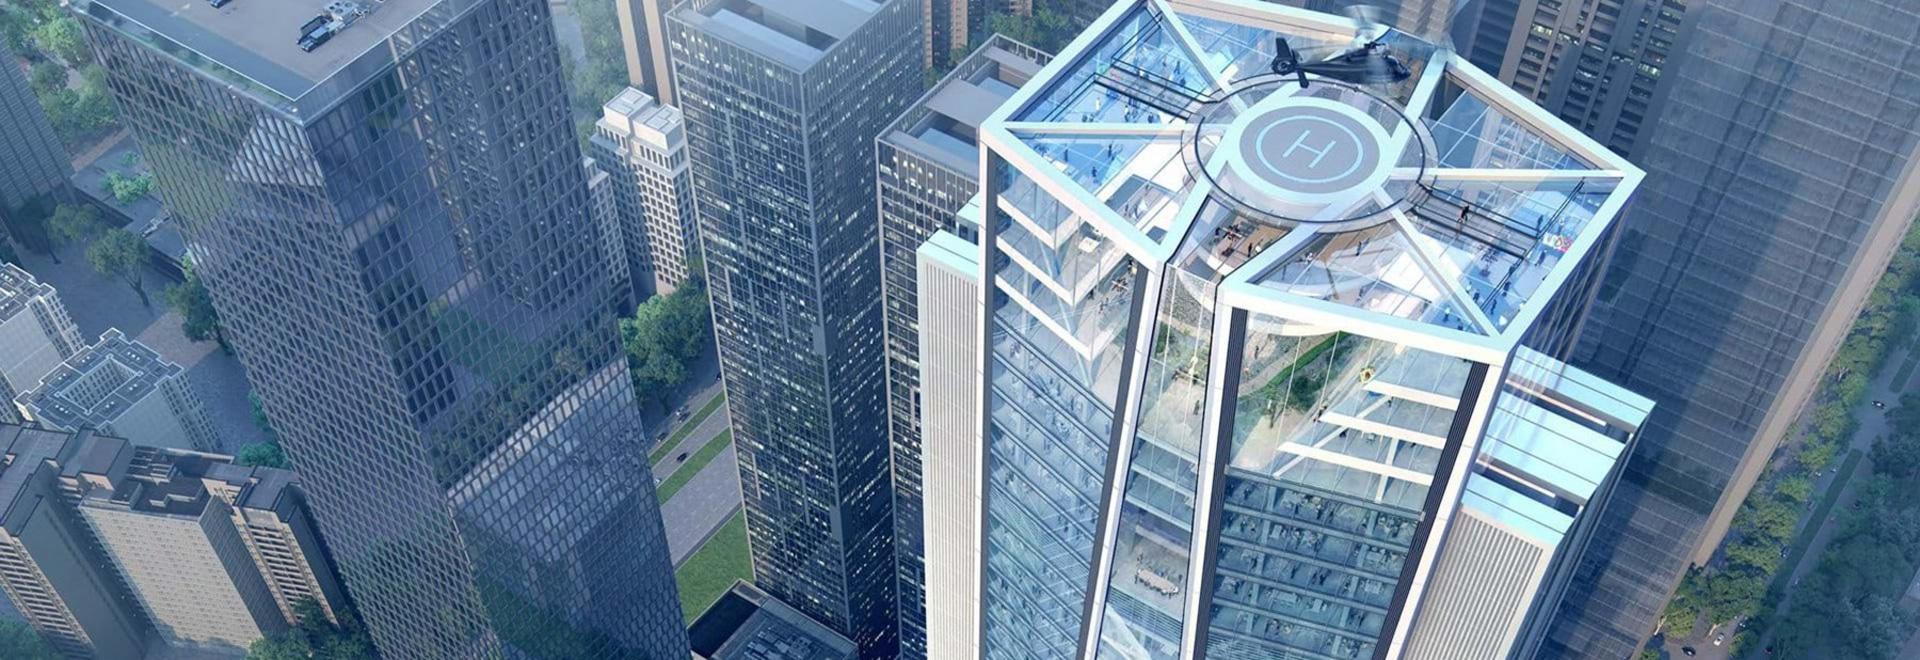 foster + partners designs skyscraper for china merchants bank in shenzhen